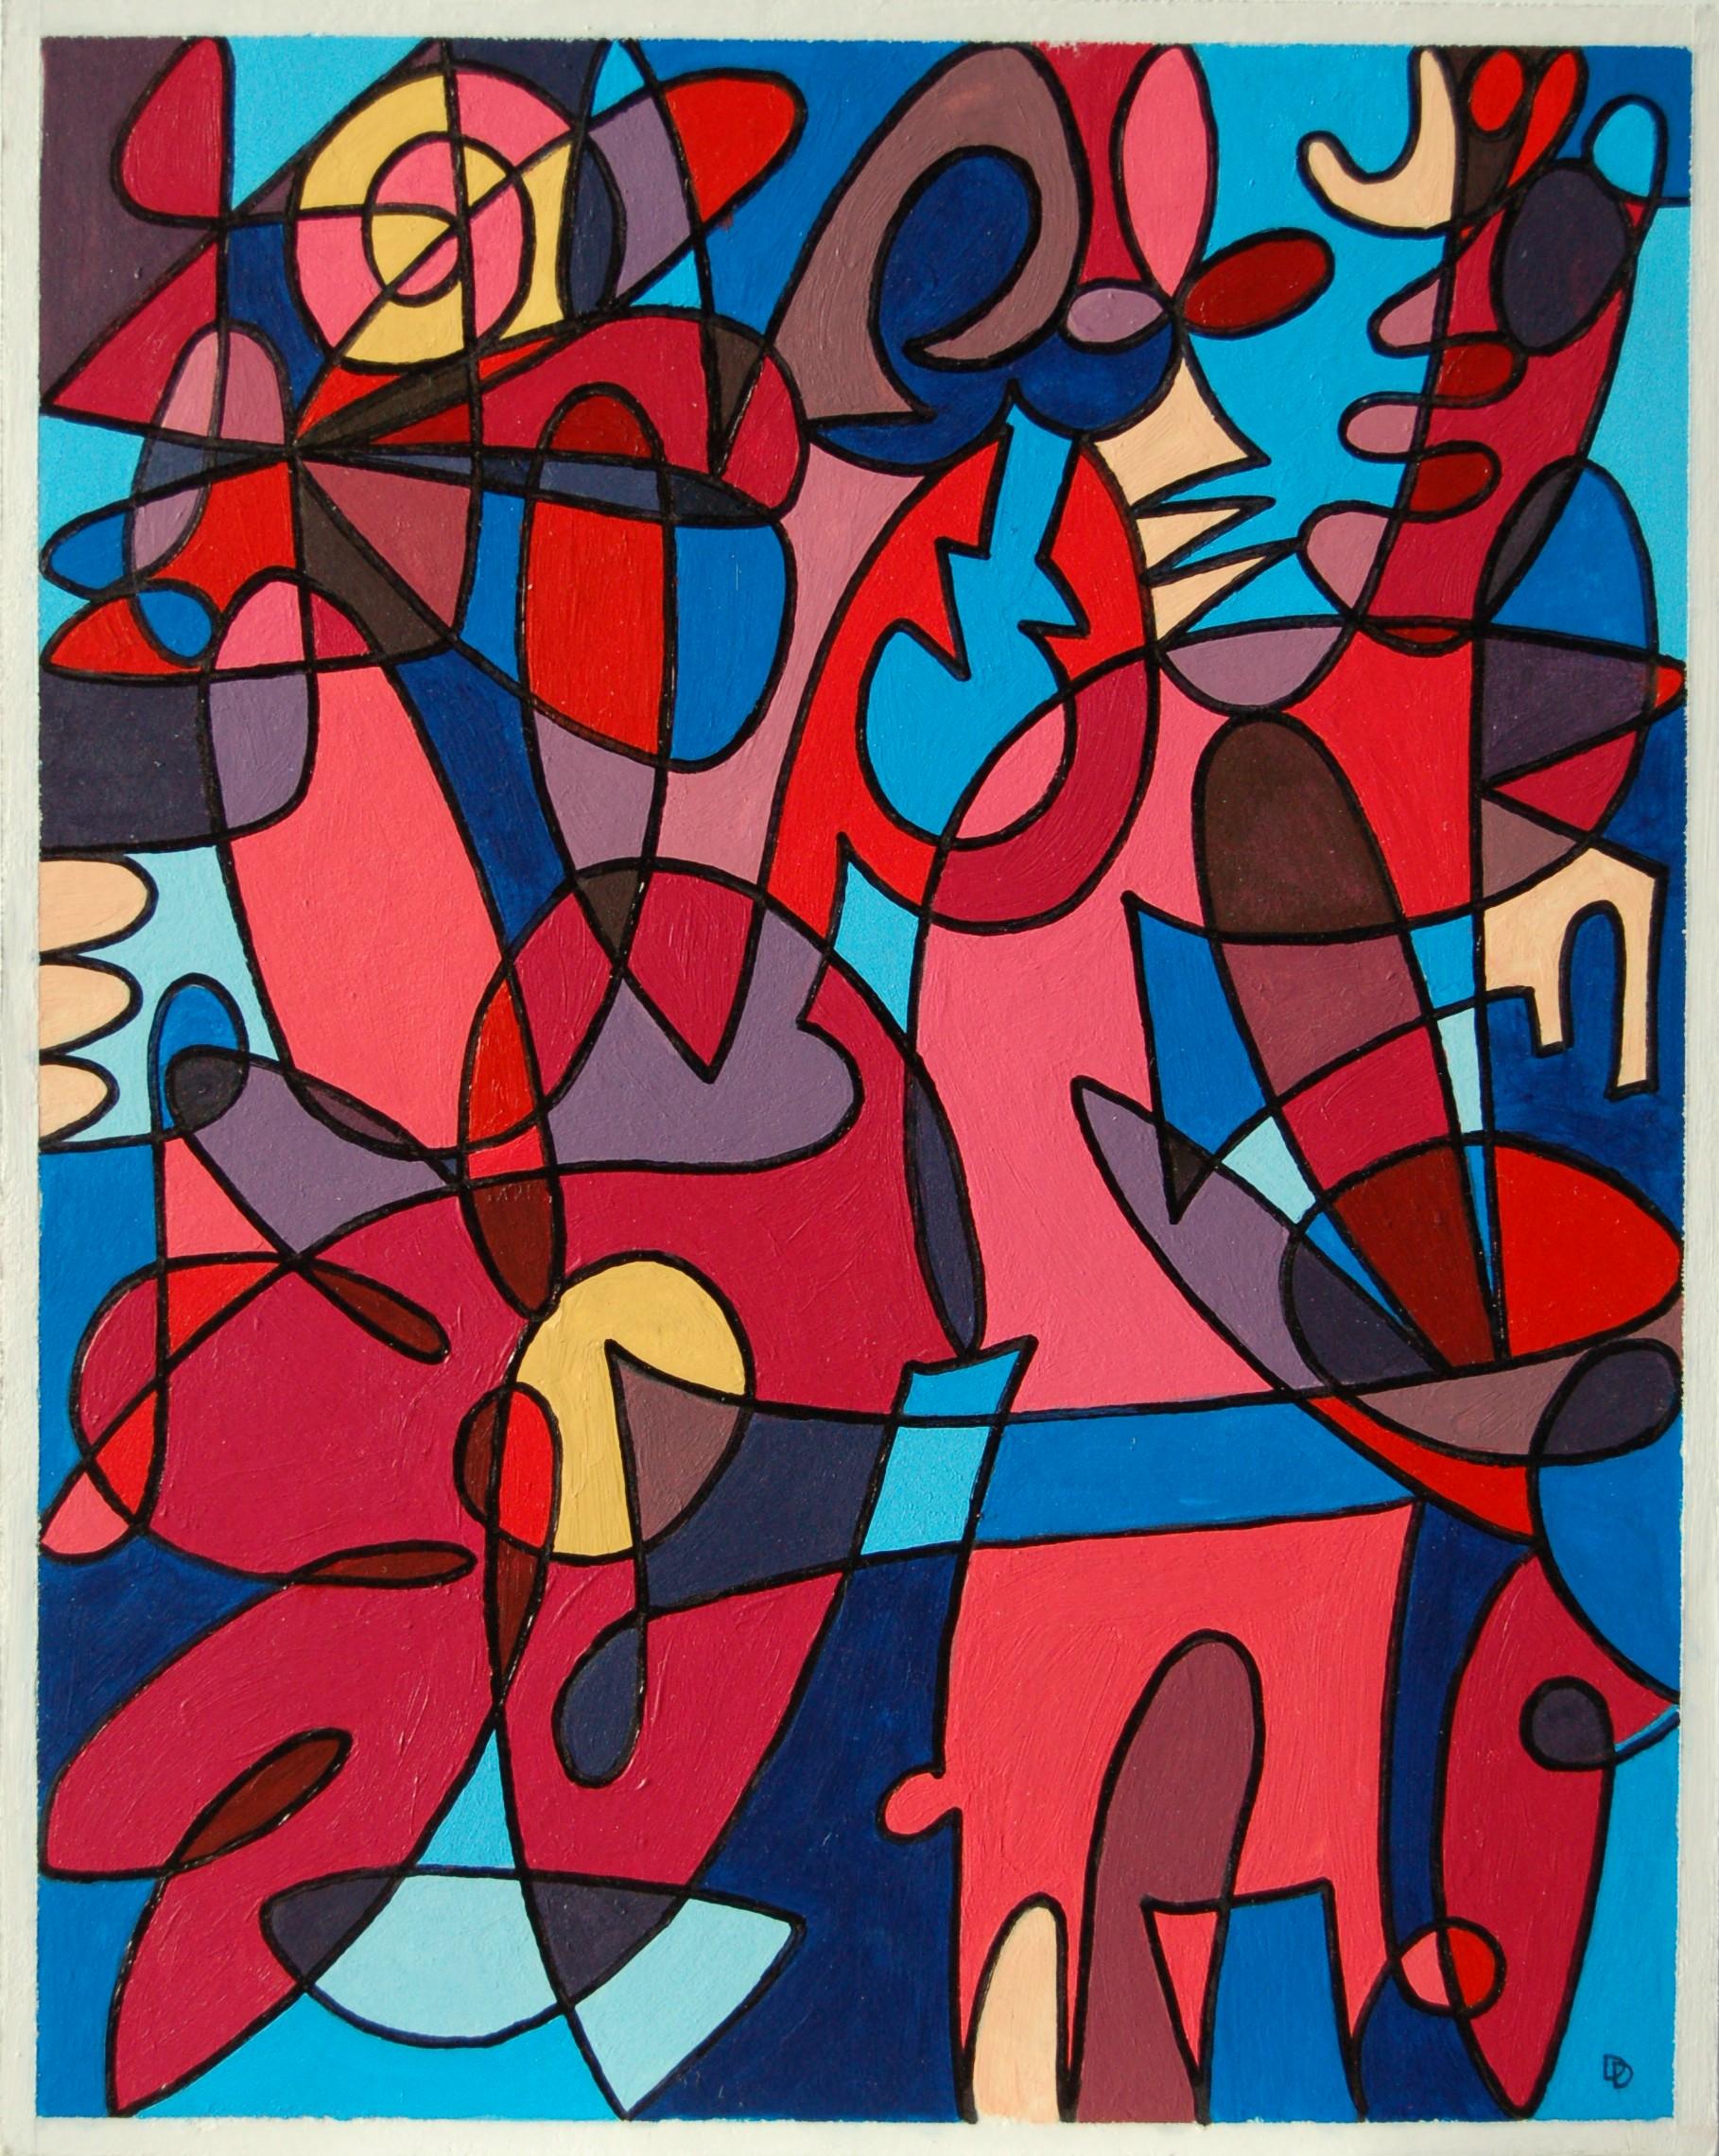 "Untitled 2, Acrylic on Rag Board, 8"" x 10"", SOLD"